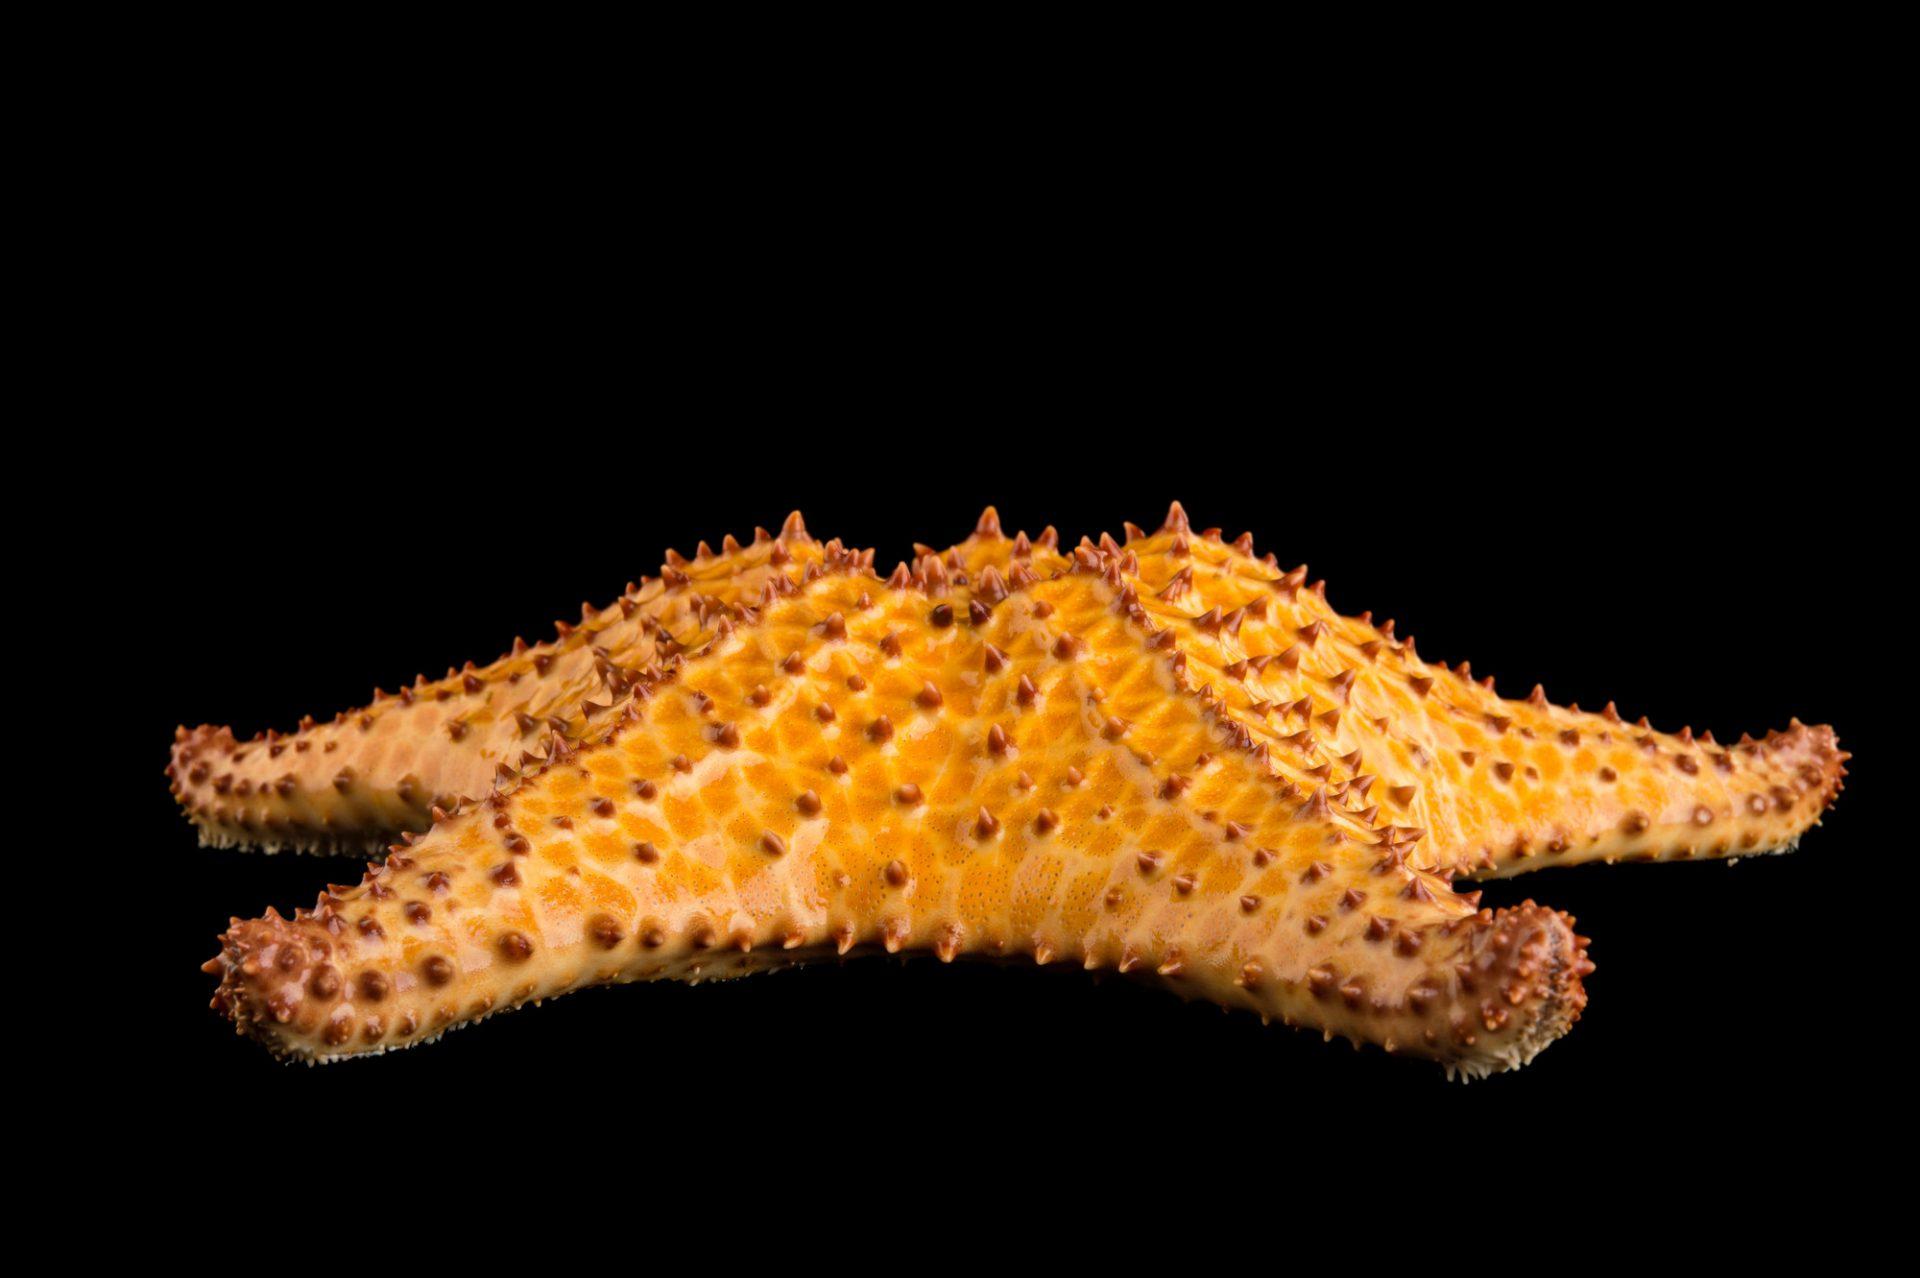 A red cushion sea star, Oreaster reticulatus.